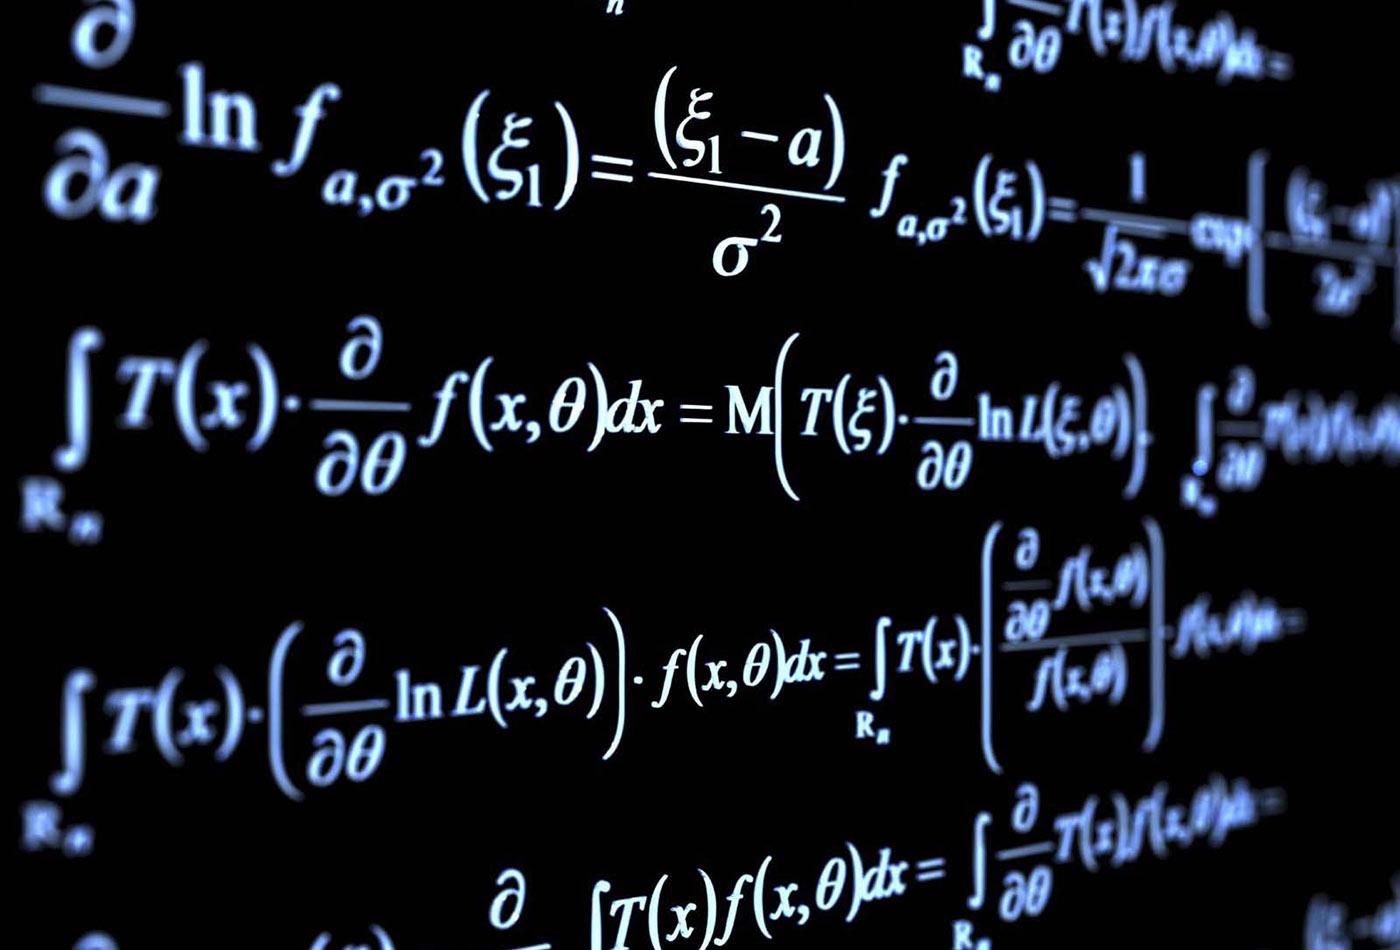 Random mathematical formulæ illustrating the field of pure mathematics.